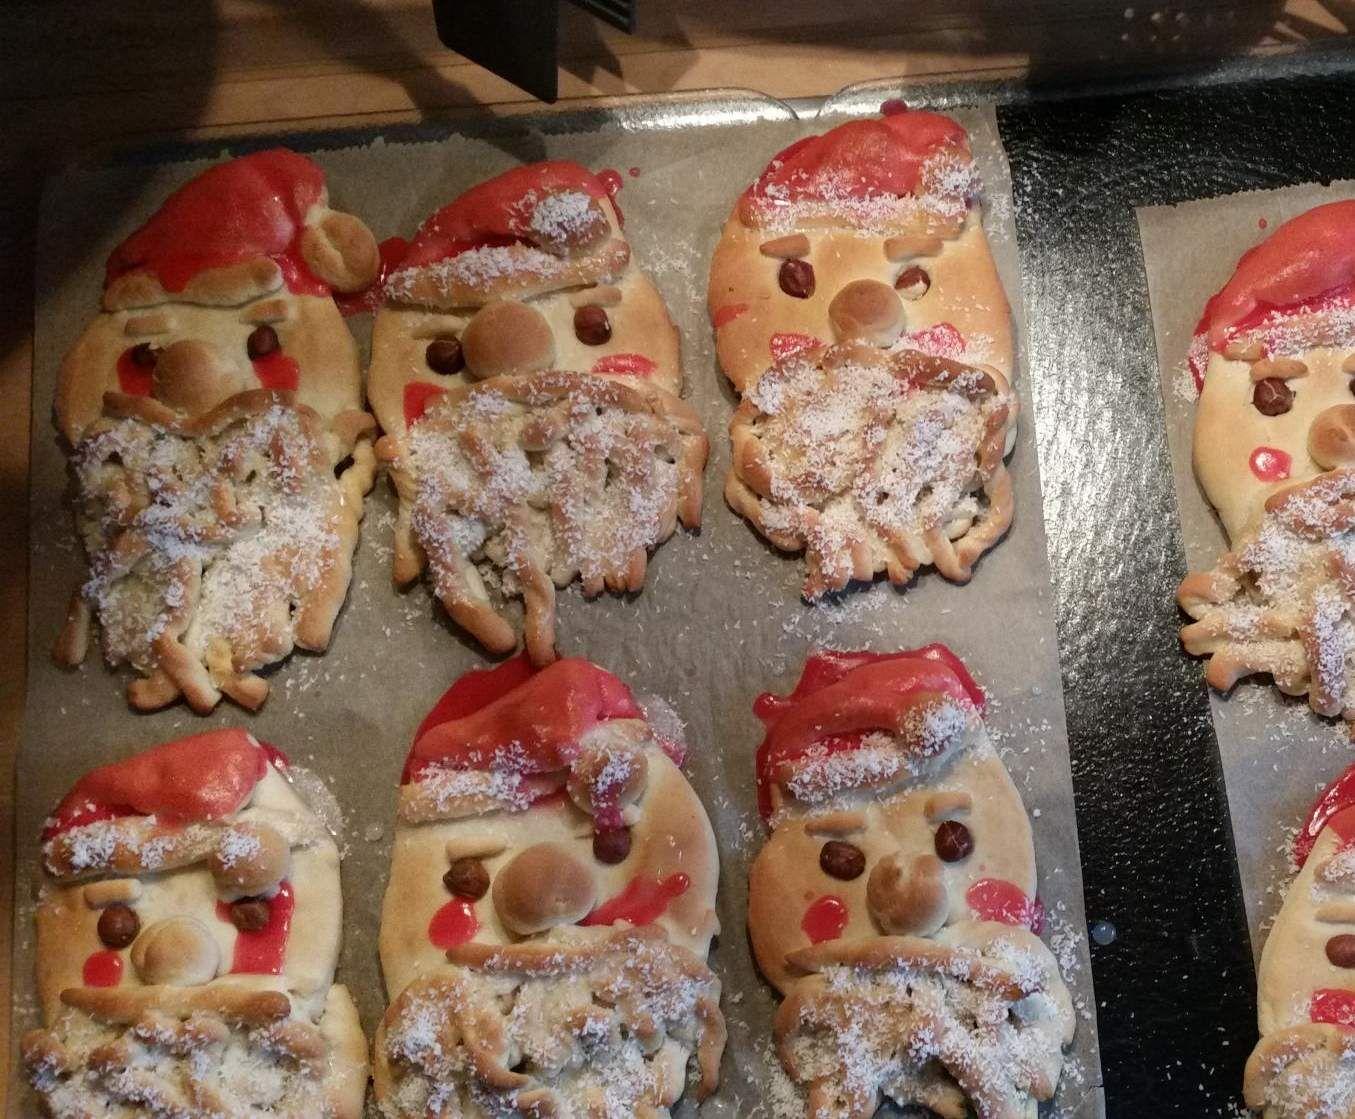 Se Nikolause zu Nikolaus  Rezept  Kuchen Torten  Kleingebck  Pinterest  Nikolaus